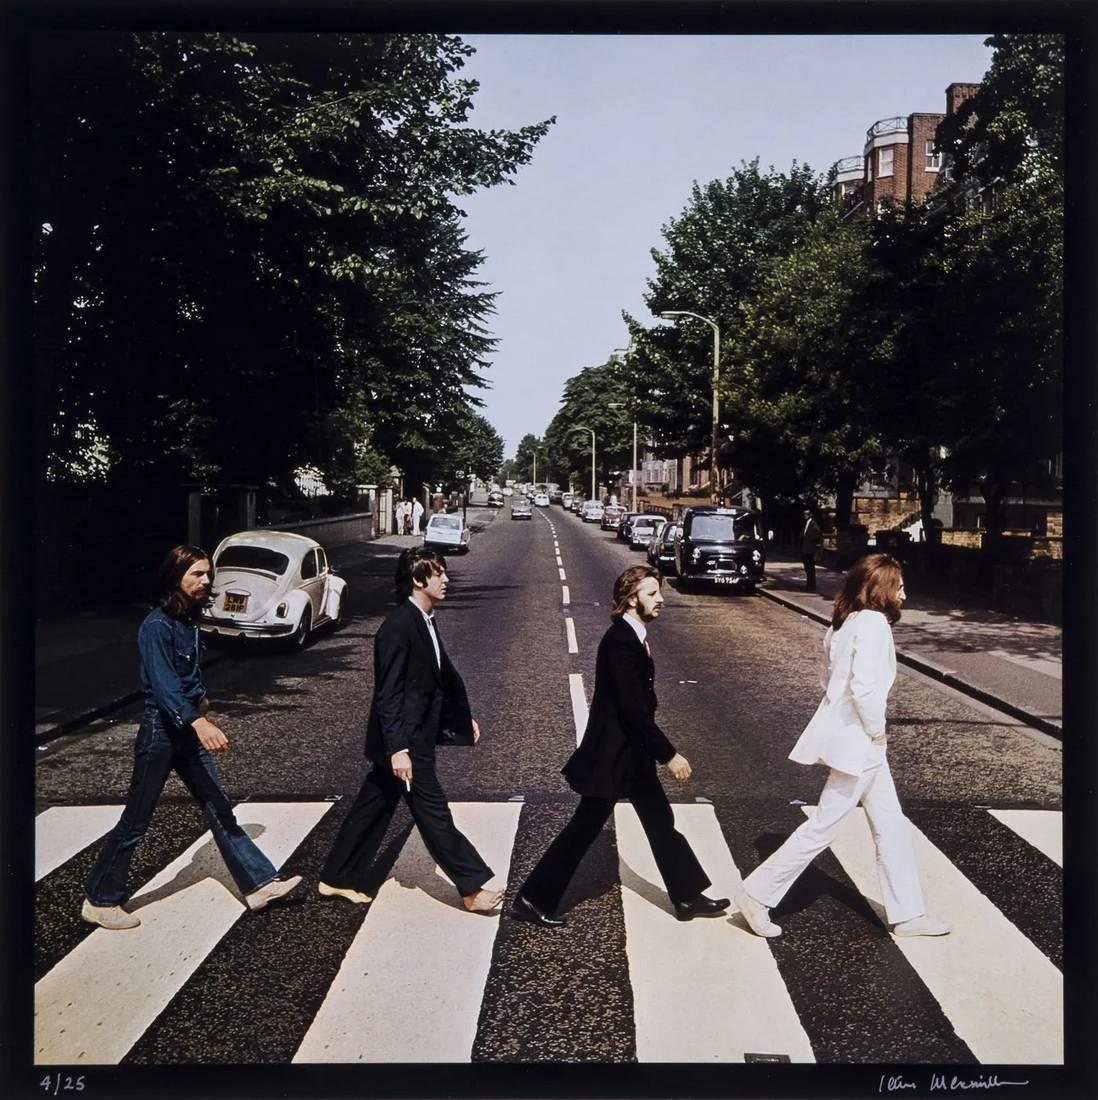 The Beatles Abbey Road le making of de la cover de Iain MacMillanThe Beatles Abbey Road le making of de la cover de Iain MacMillan